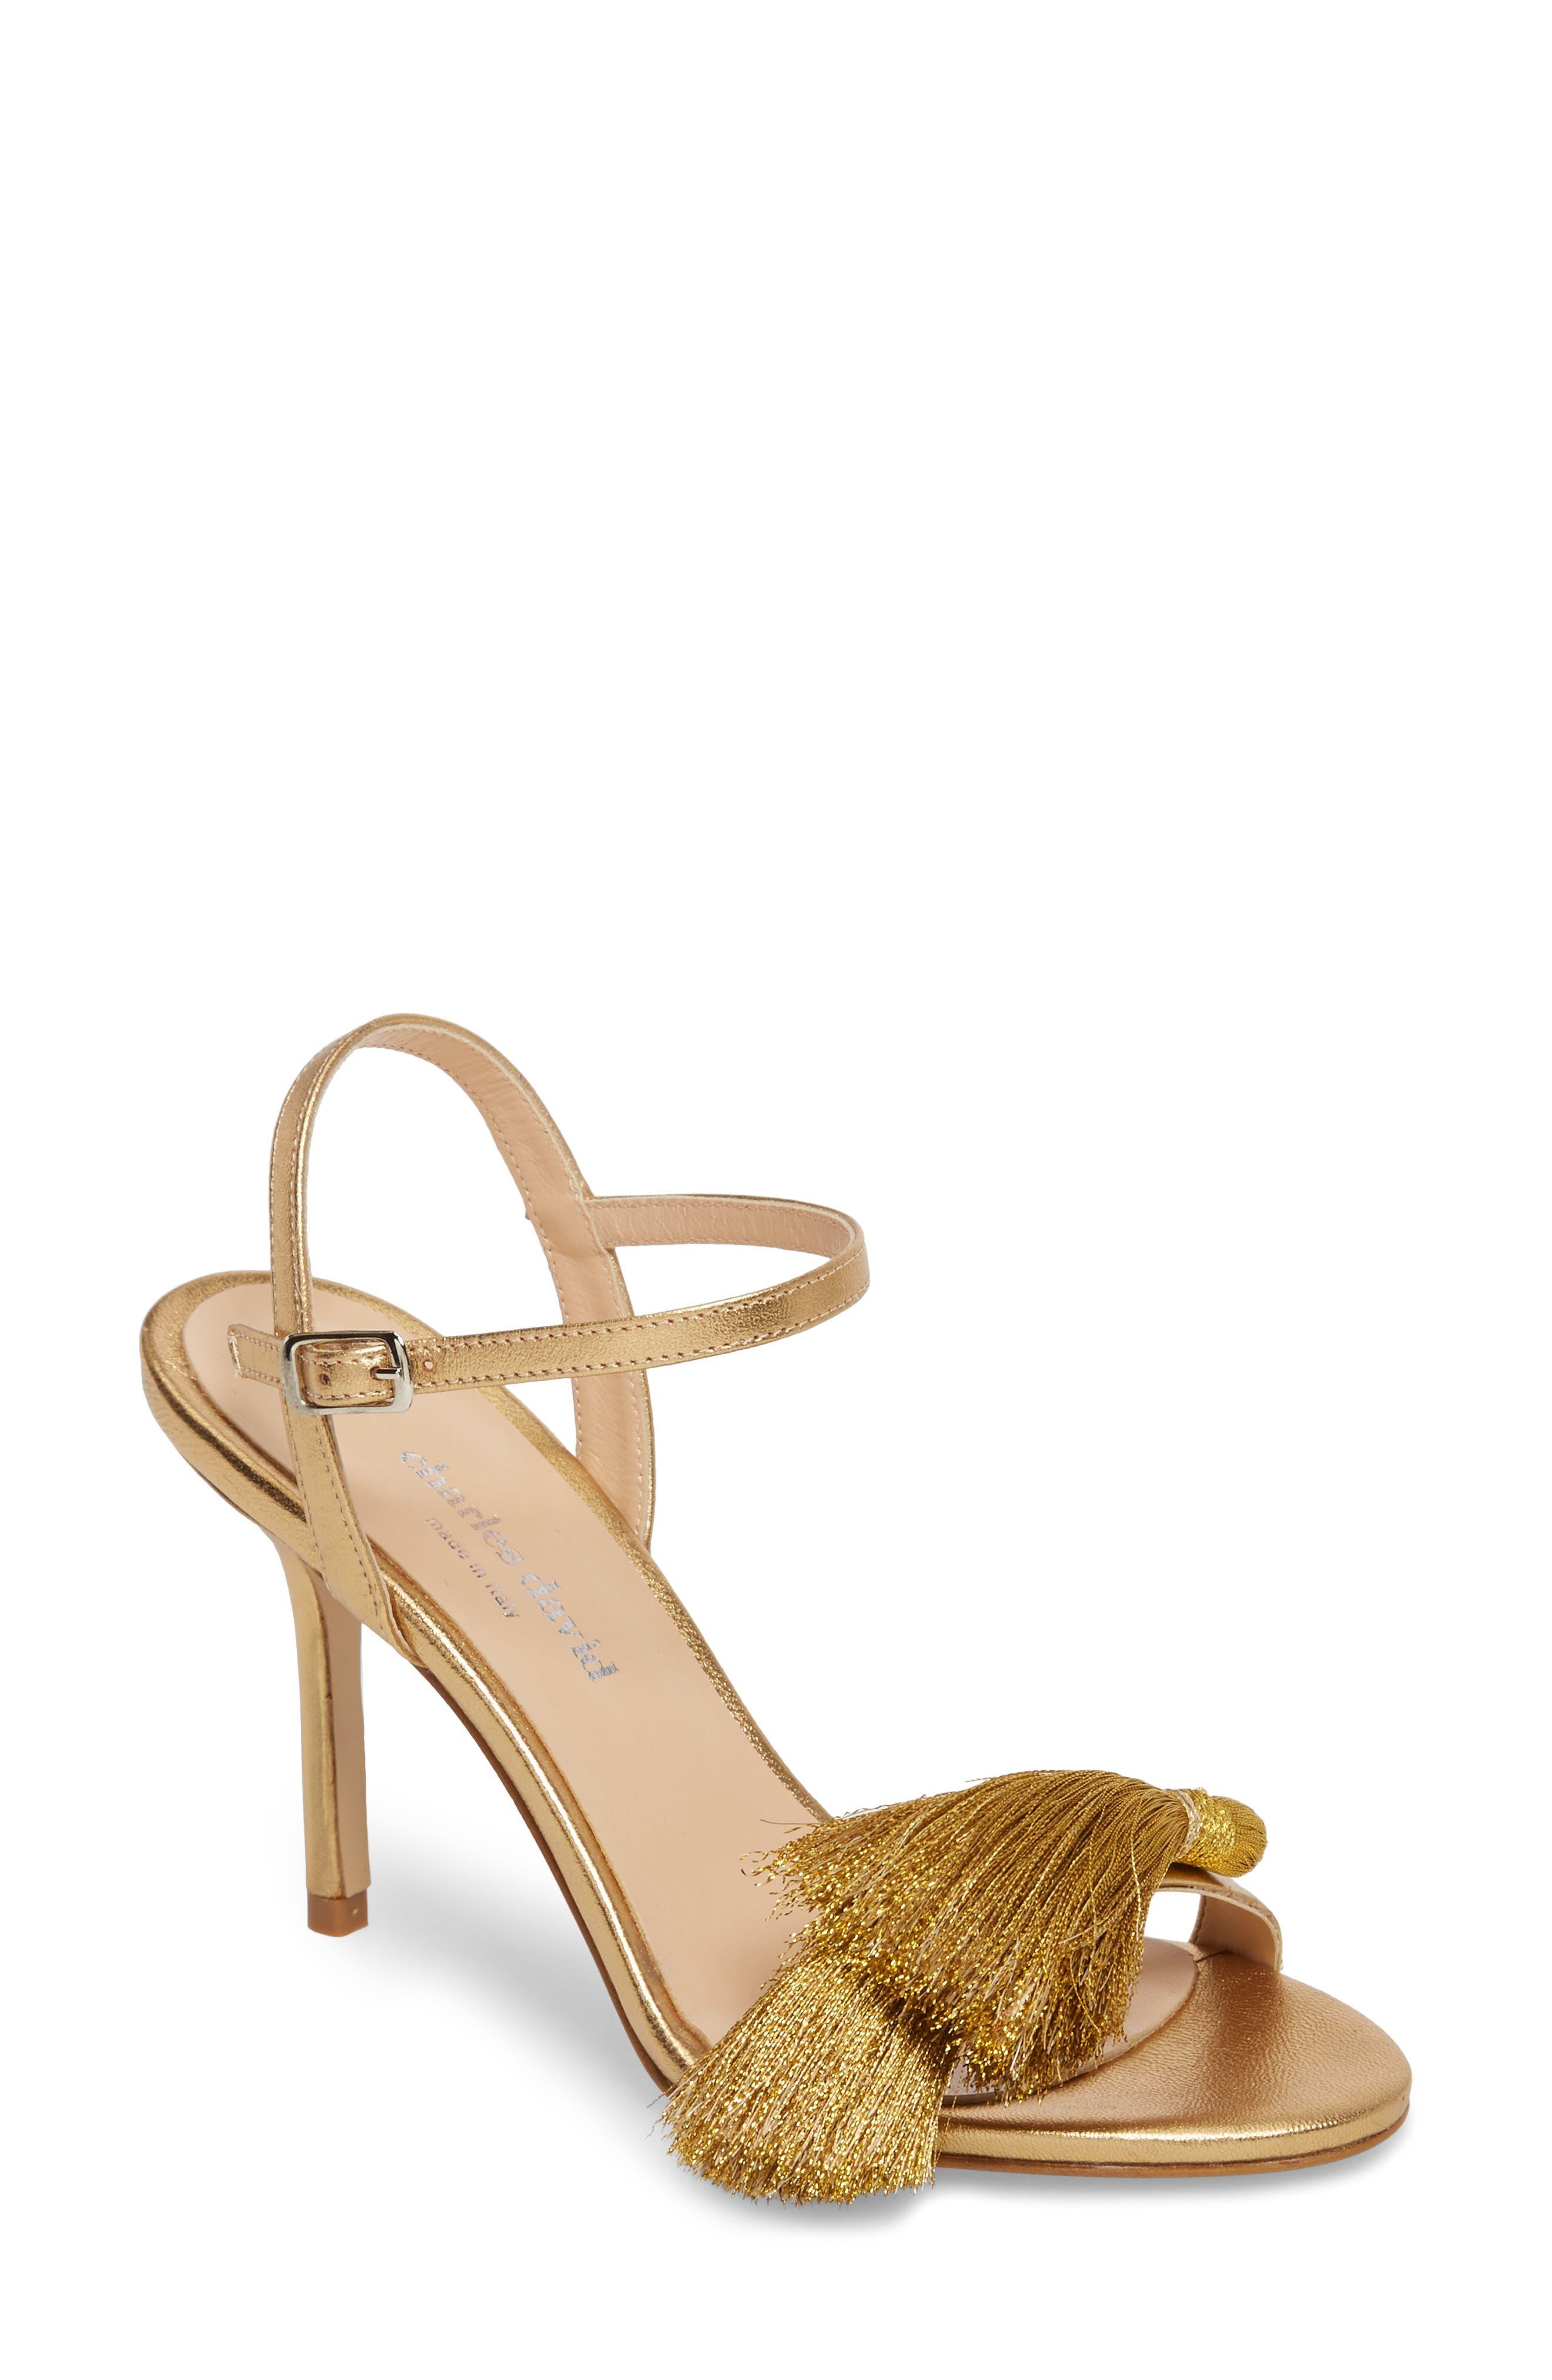 Charles David Sassy Tassel Sandal Metallic